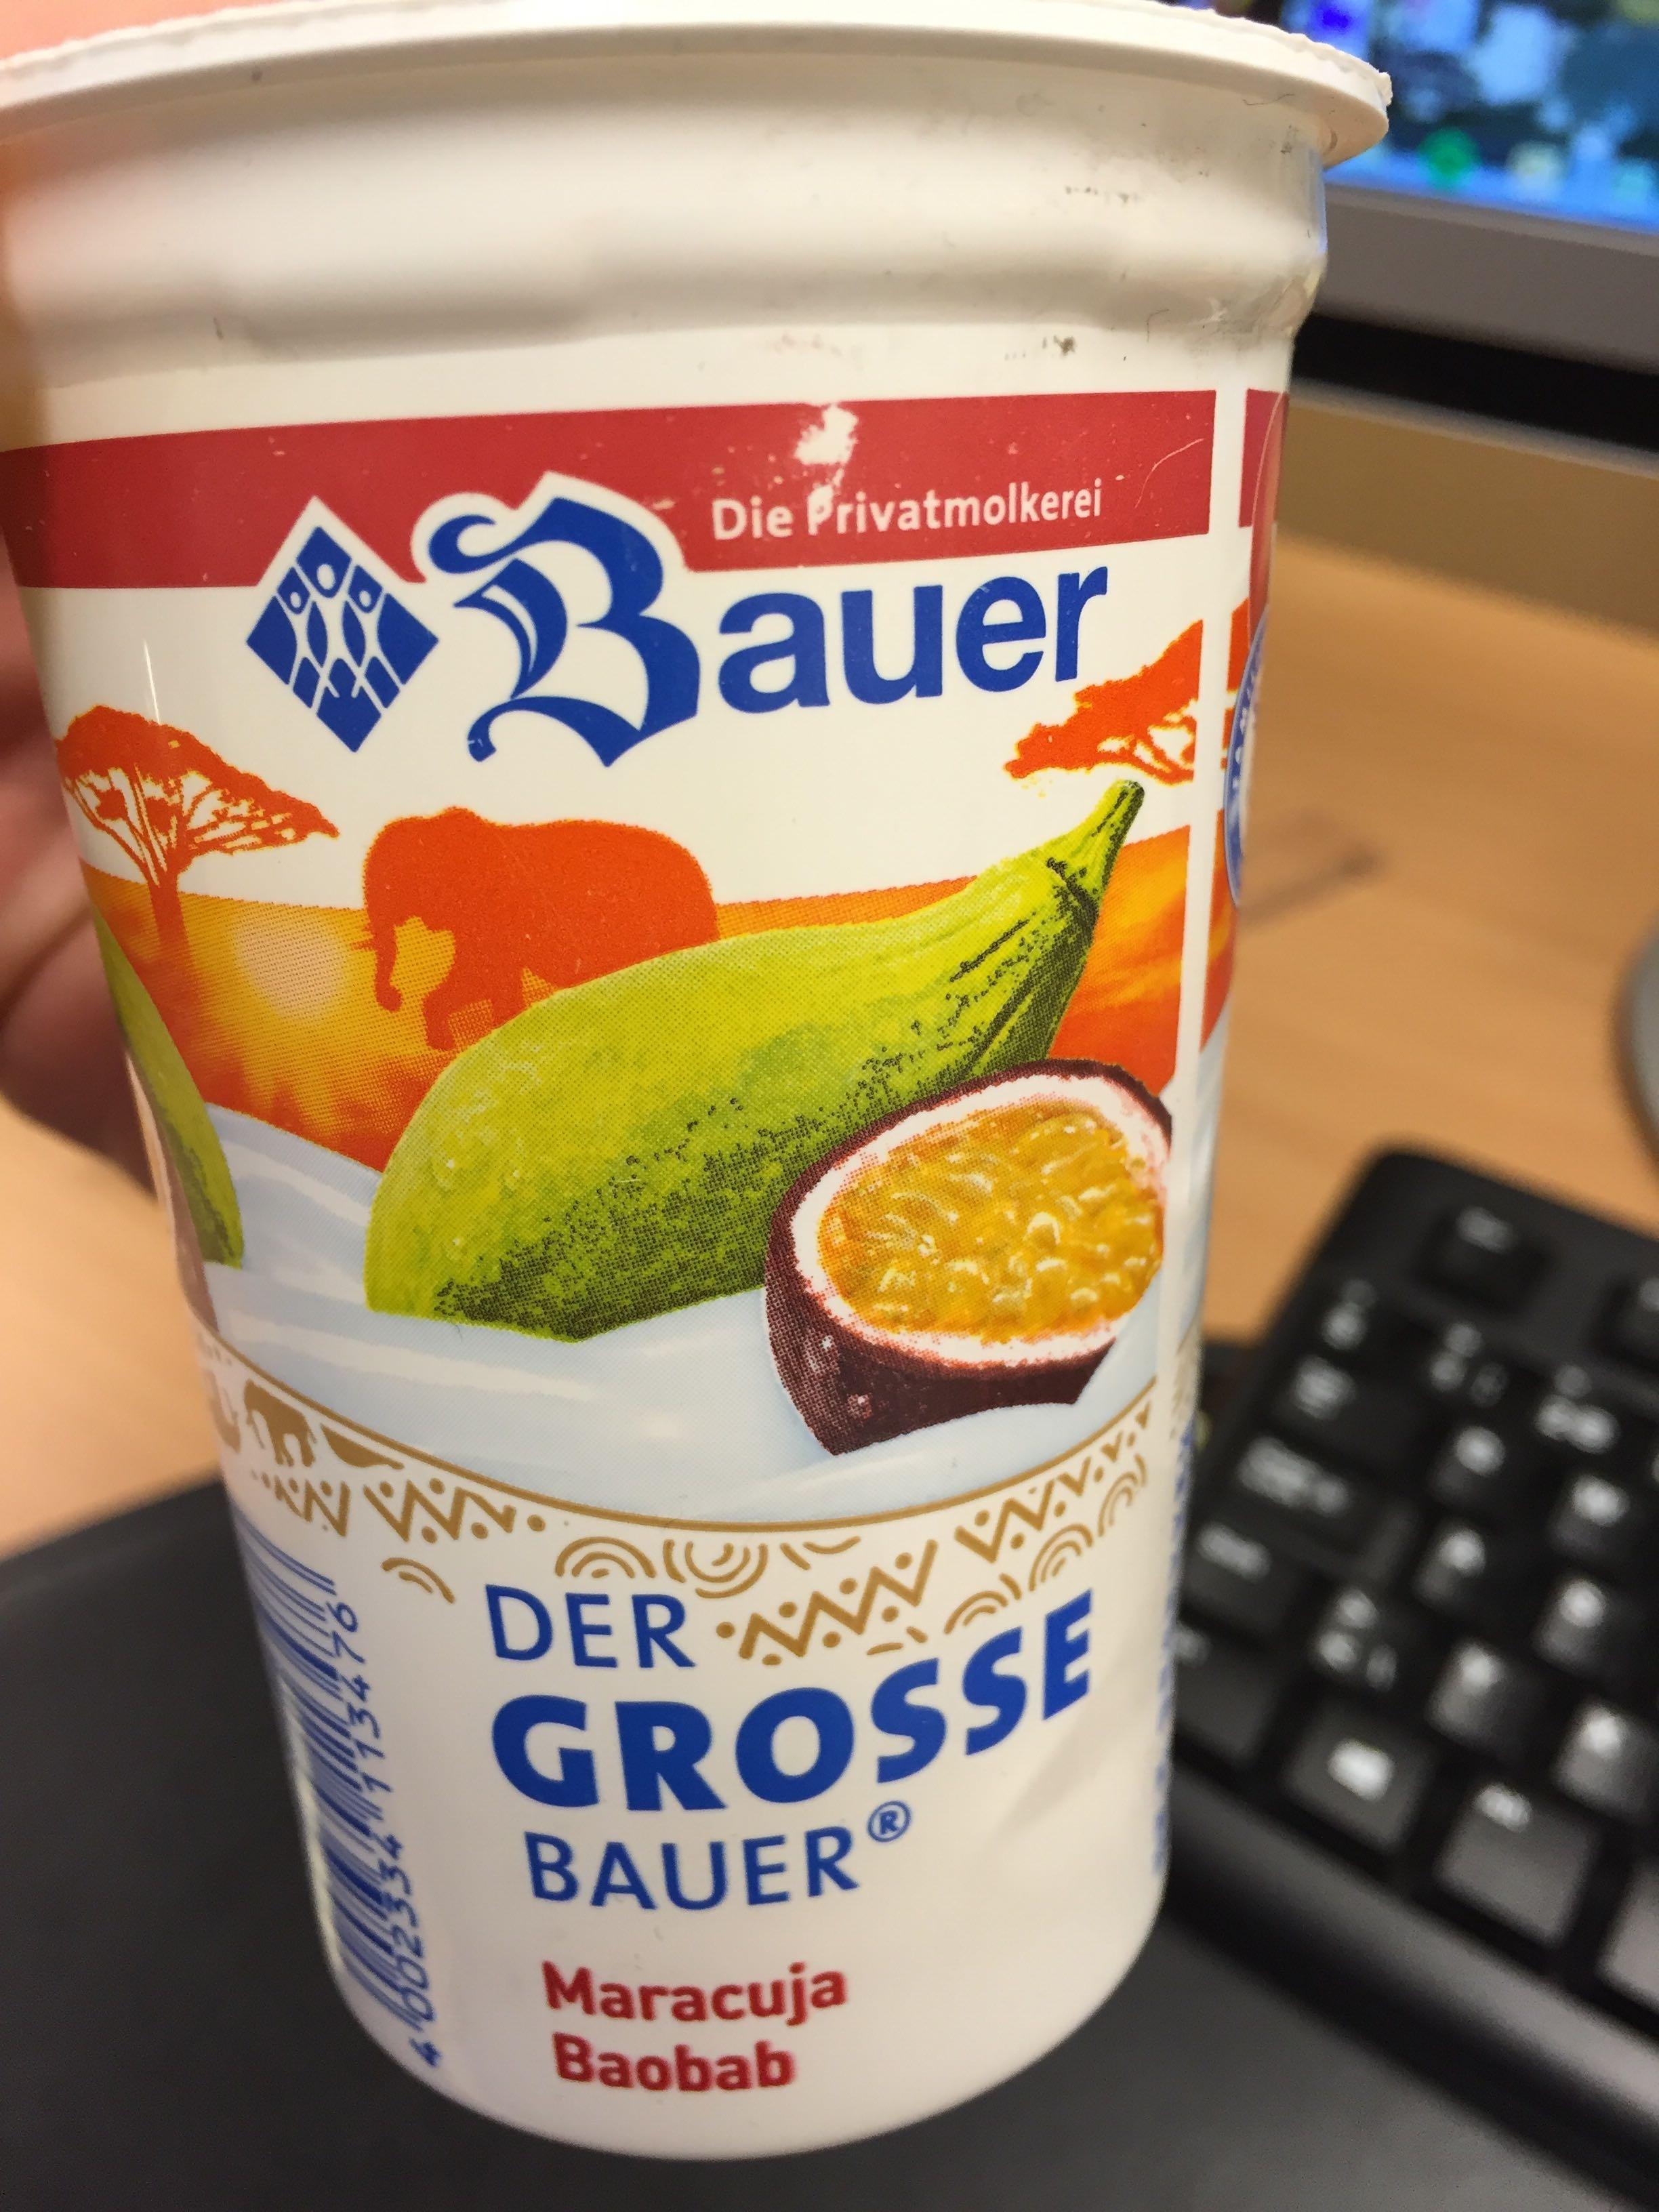 Dee grosse Bauer / Maracuja Baobab - Product